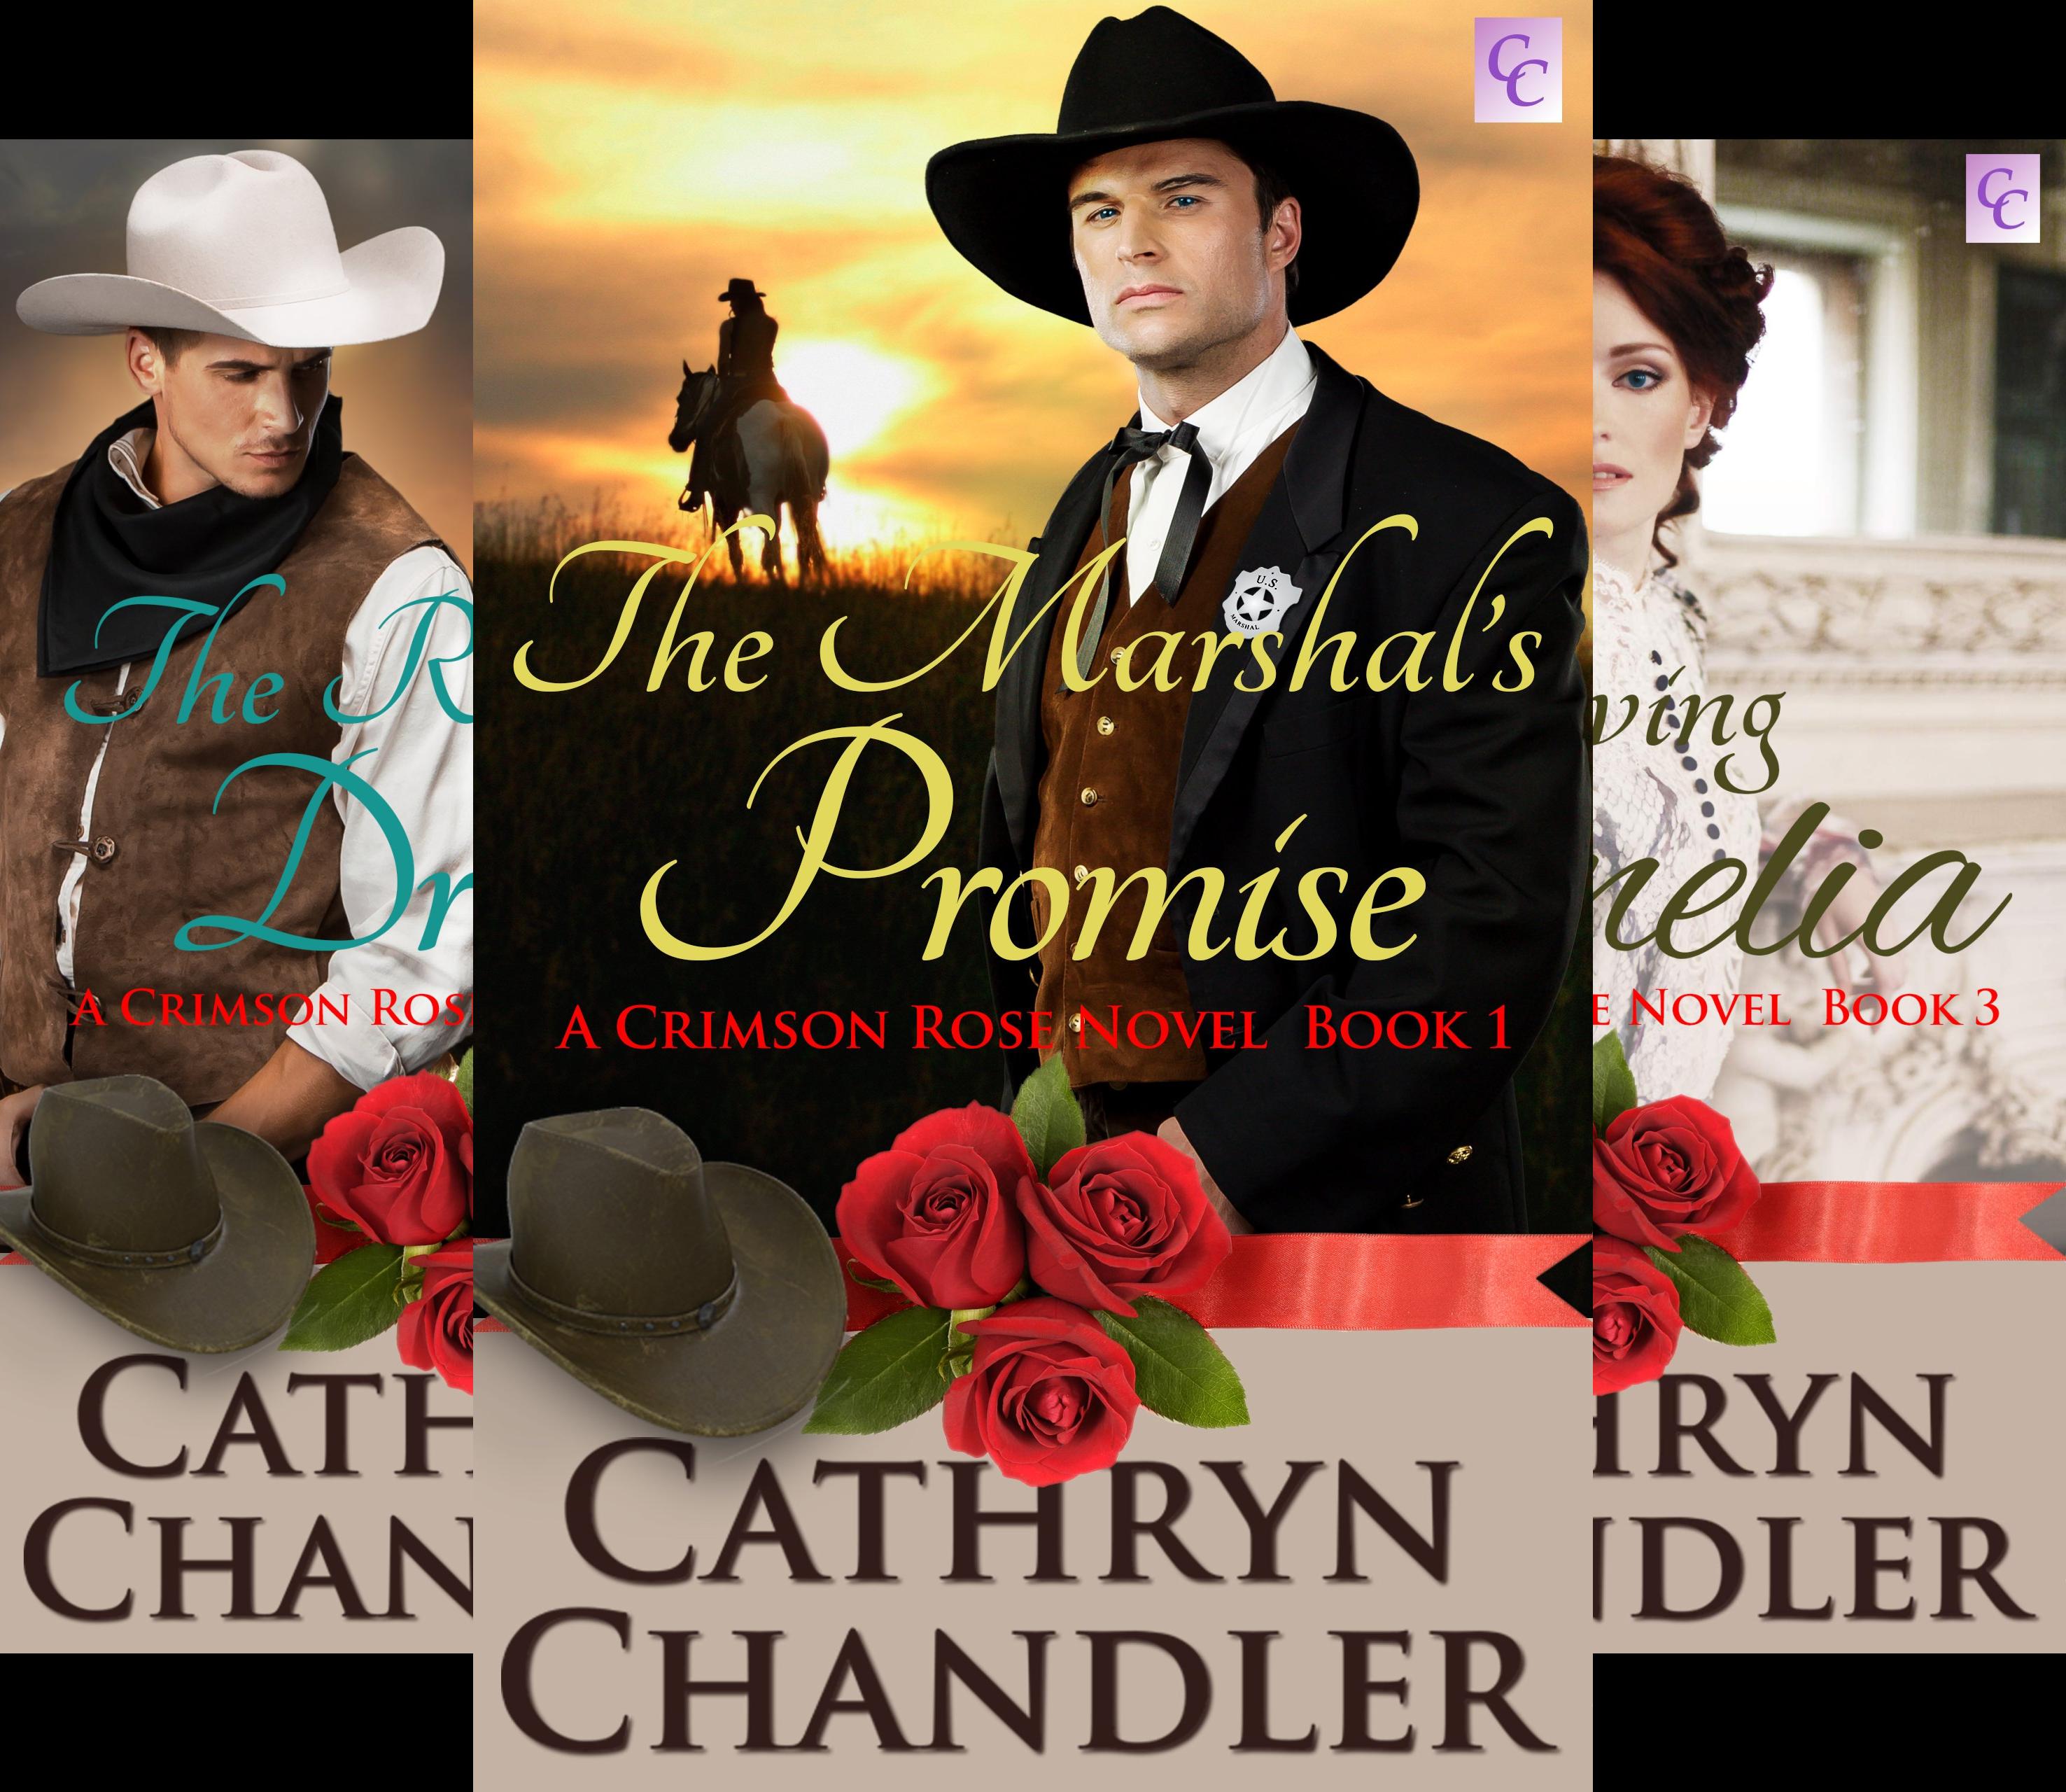 A Crimson Rose Novel (3 Book Series)